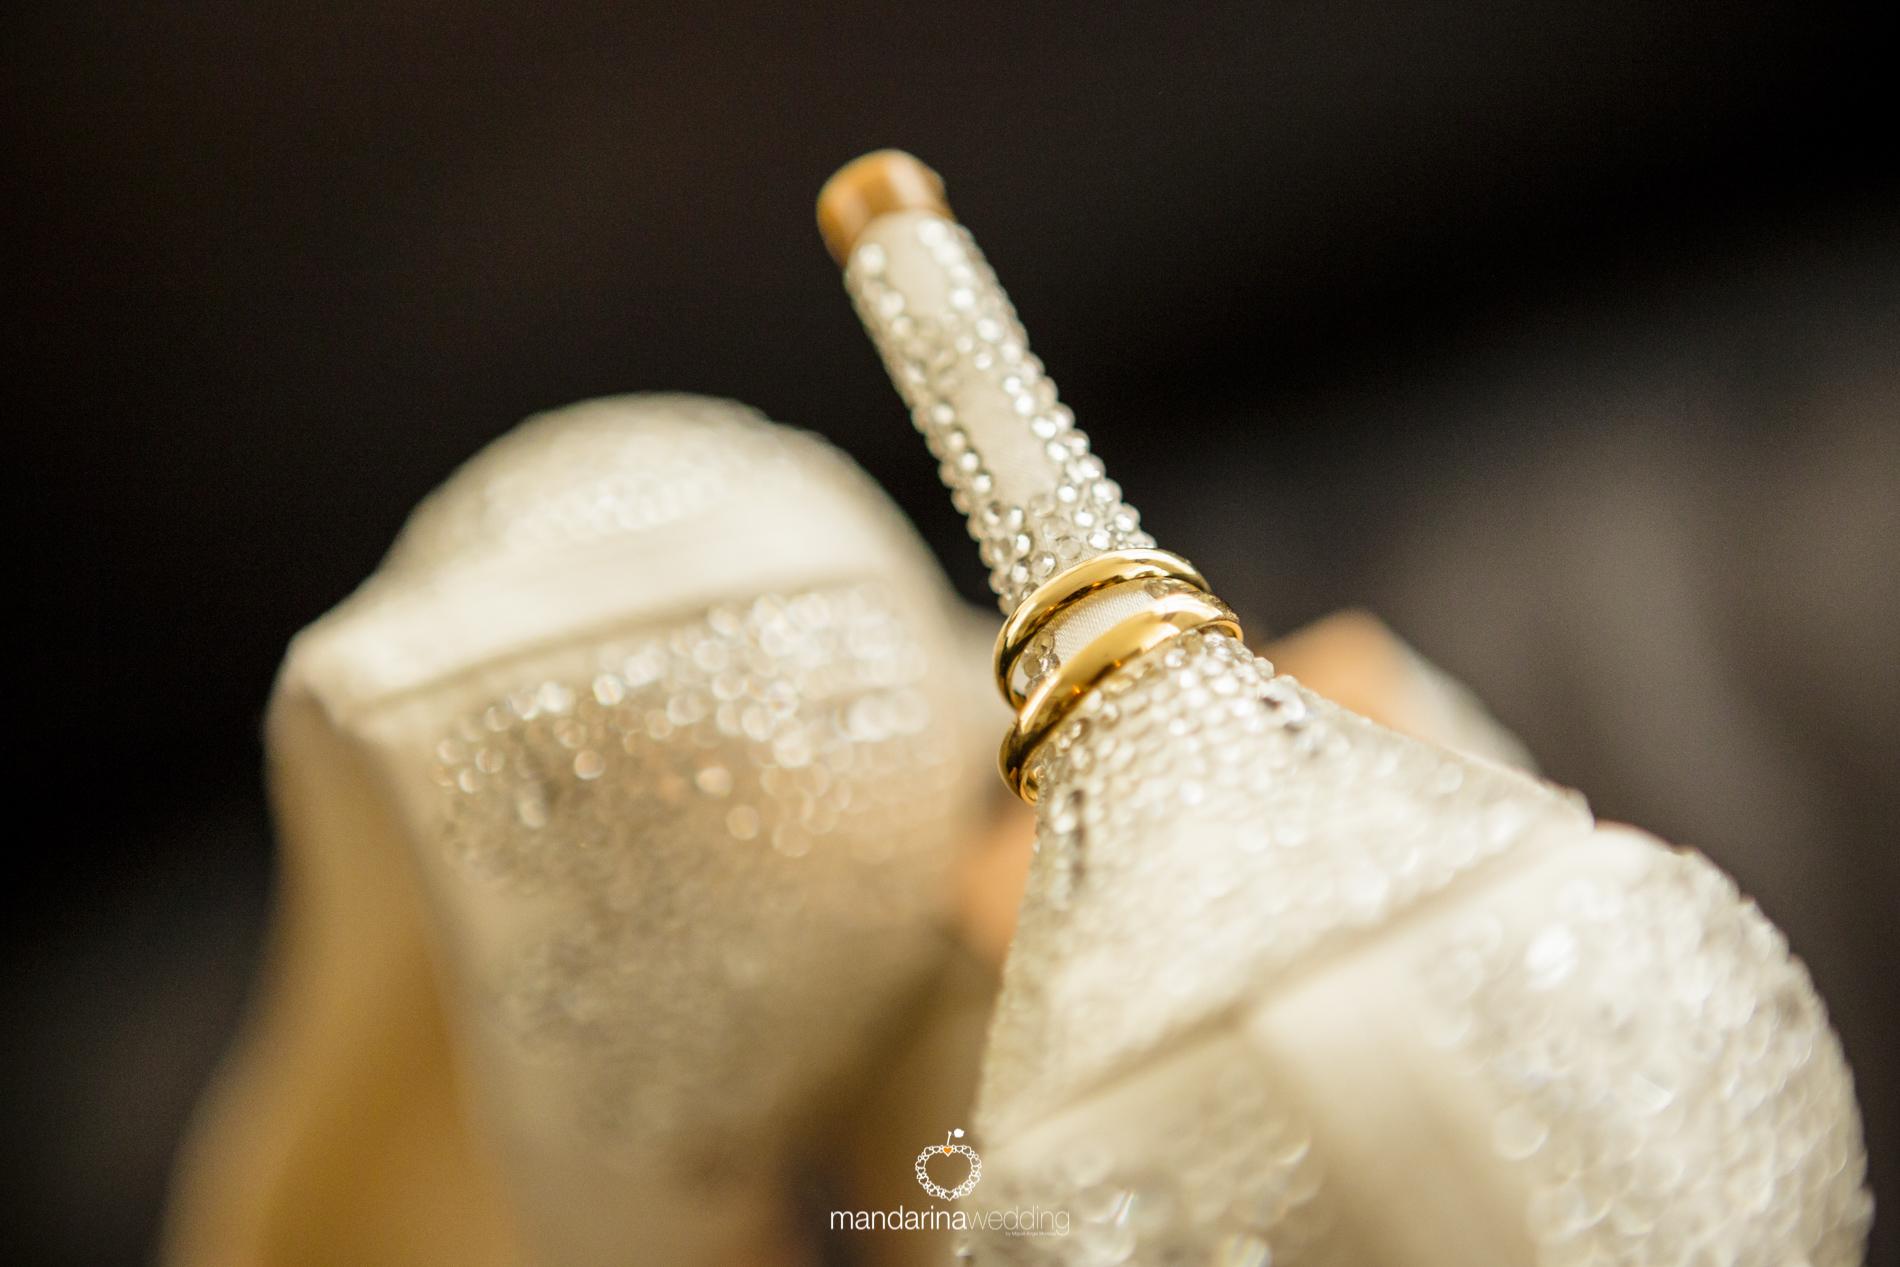 mandaria wedding, fotografos de boda, fotoperiodismo de boda, mejores fotografos de boda, bodas soria, bodas pirineo, bodas Madrid, fotógrafos tarragona_01